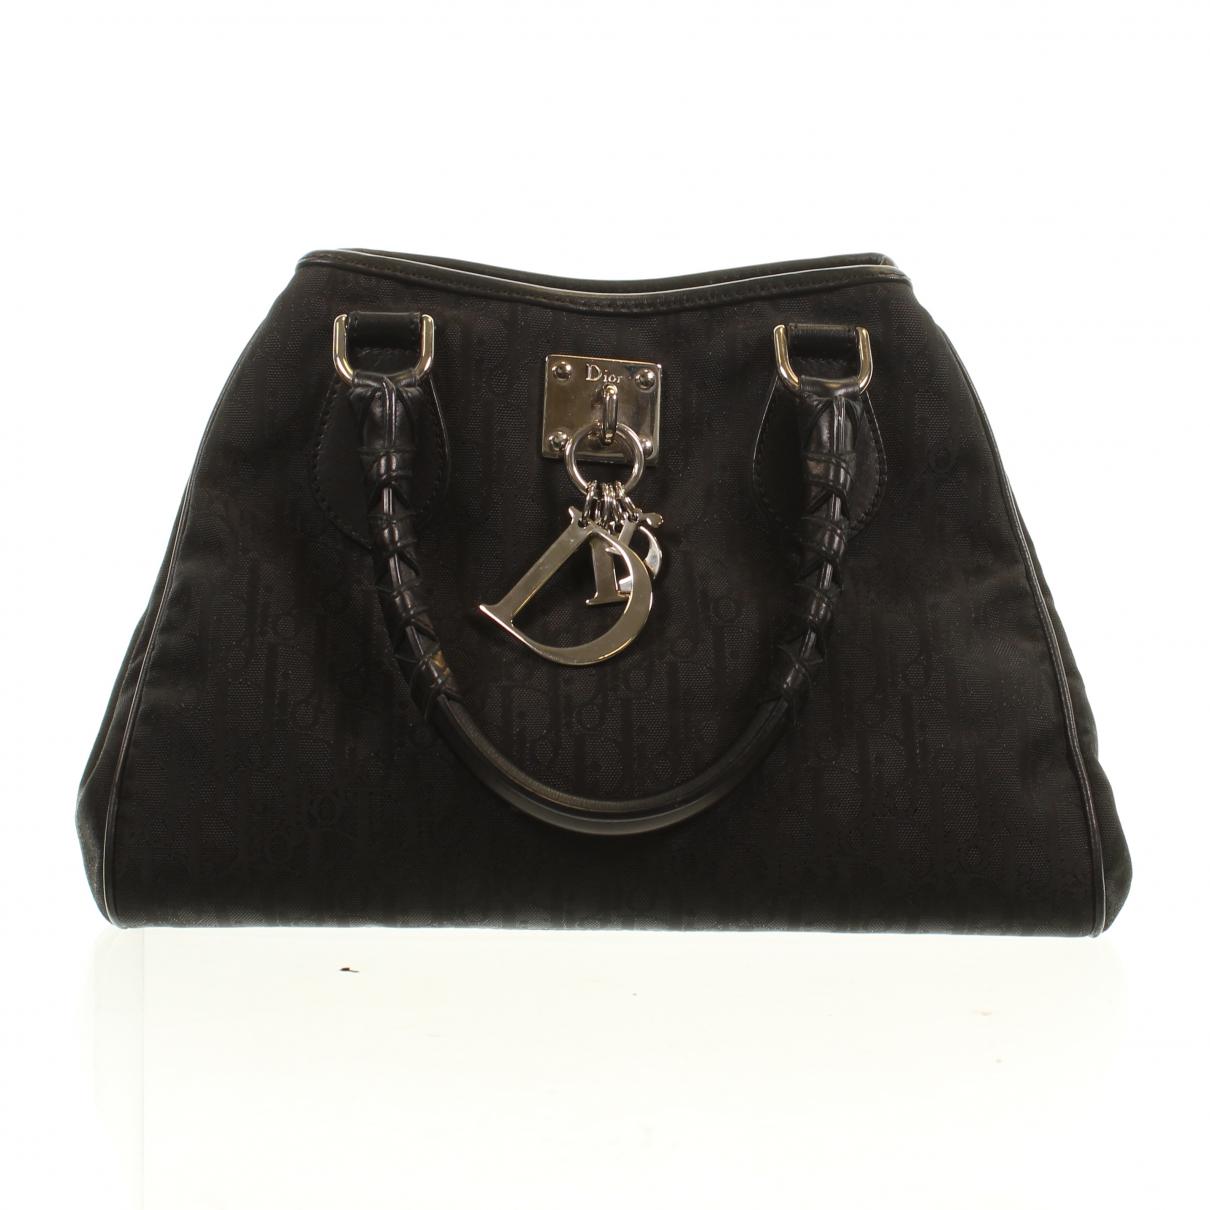 Dior \N Black handbag for Women \N